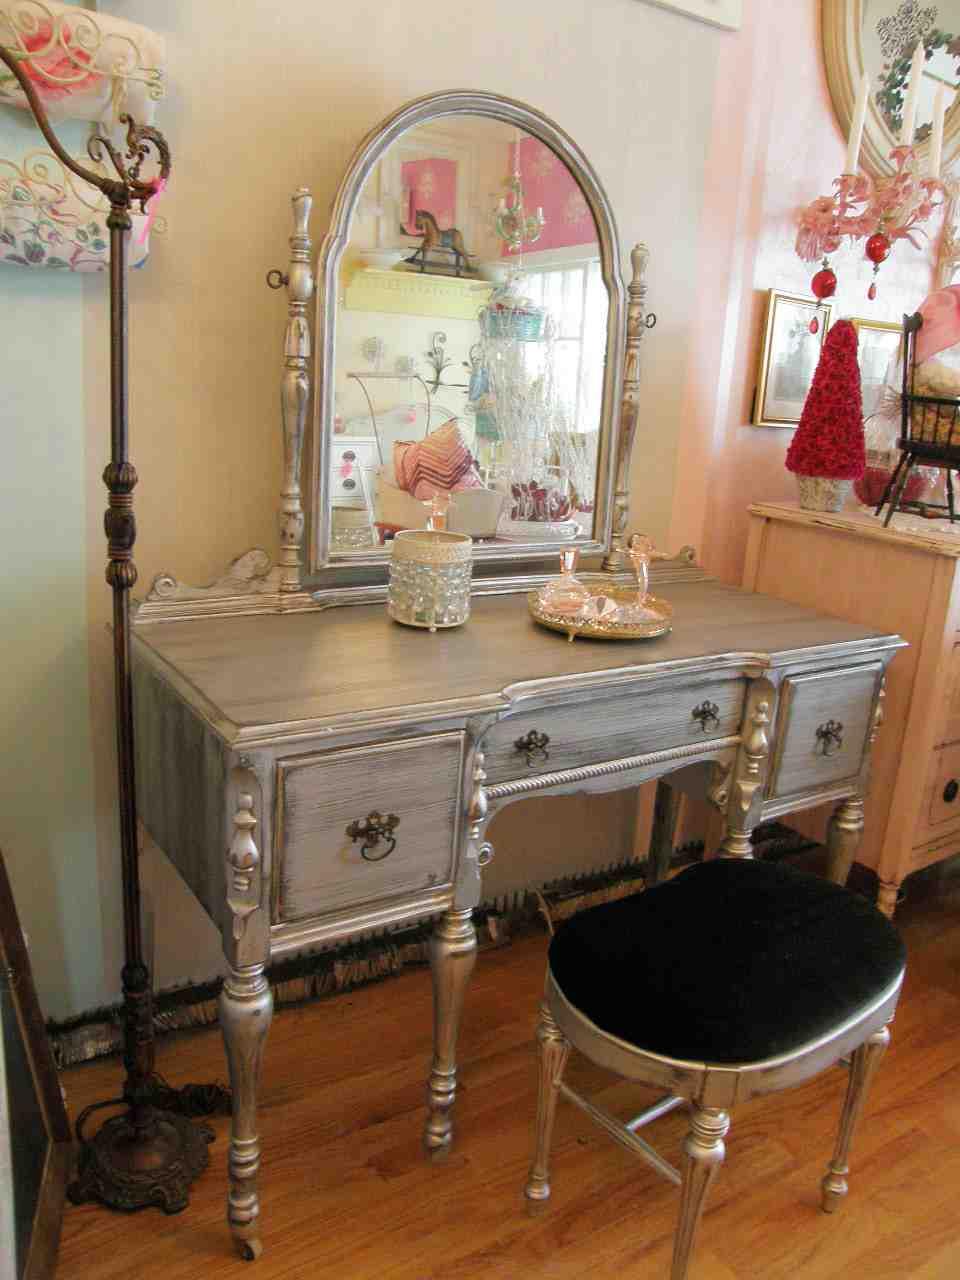 Antique Vanity Dresser with Mirror - Home Furniture Design